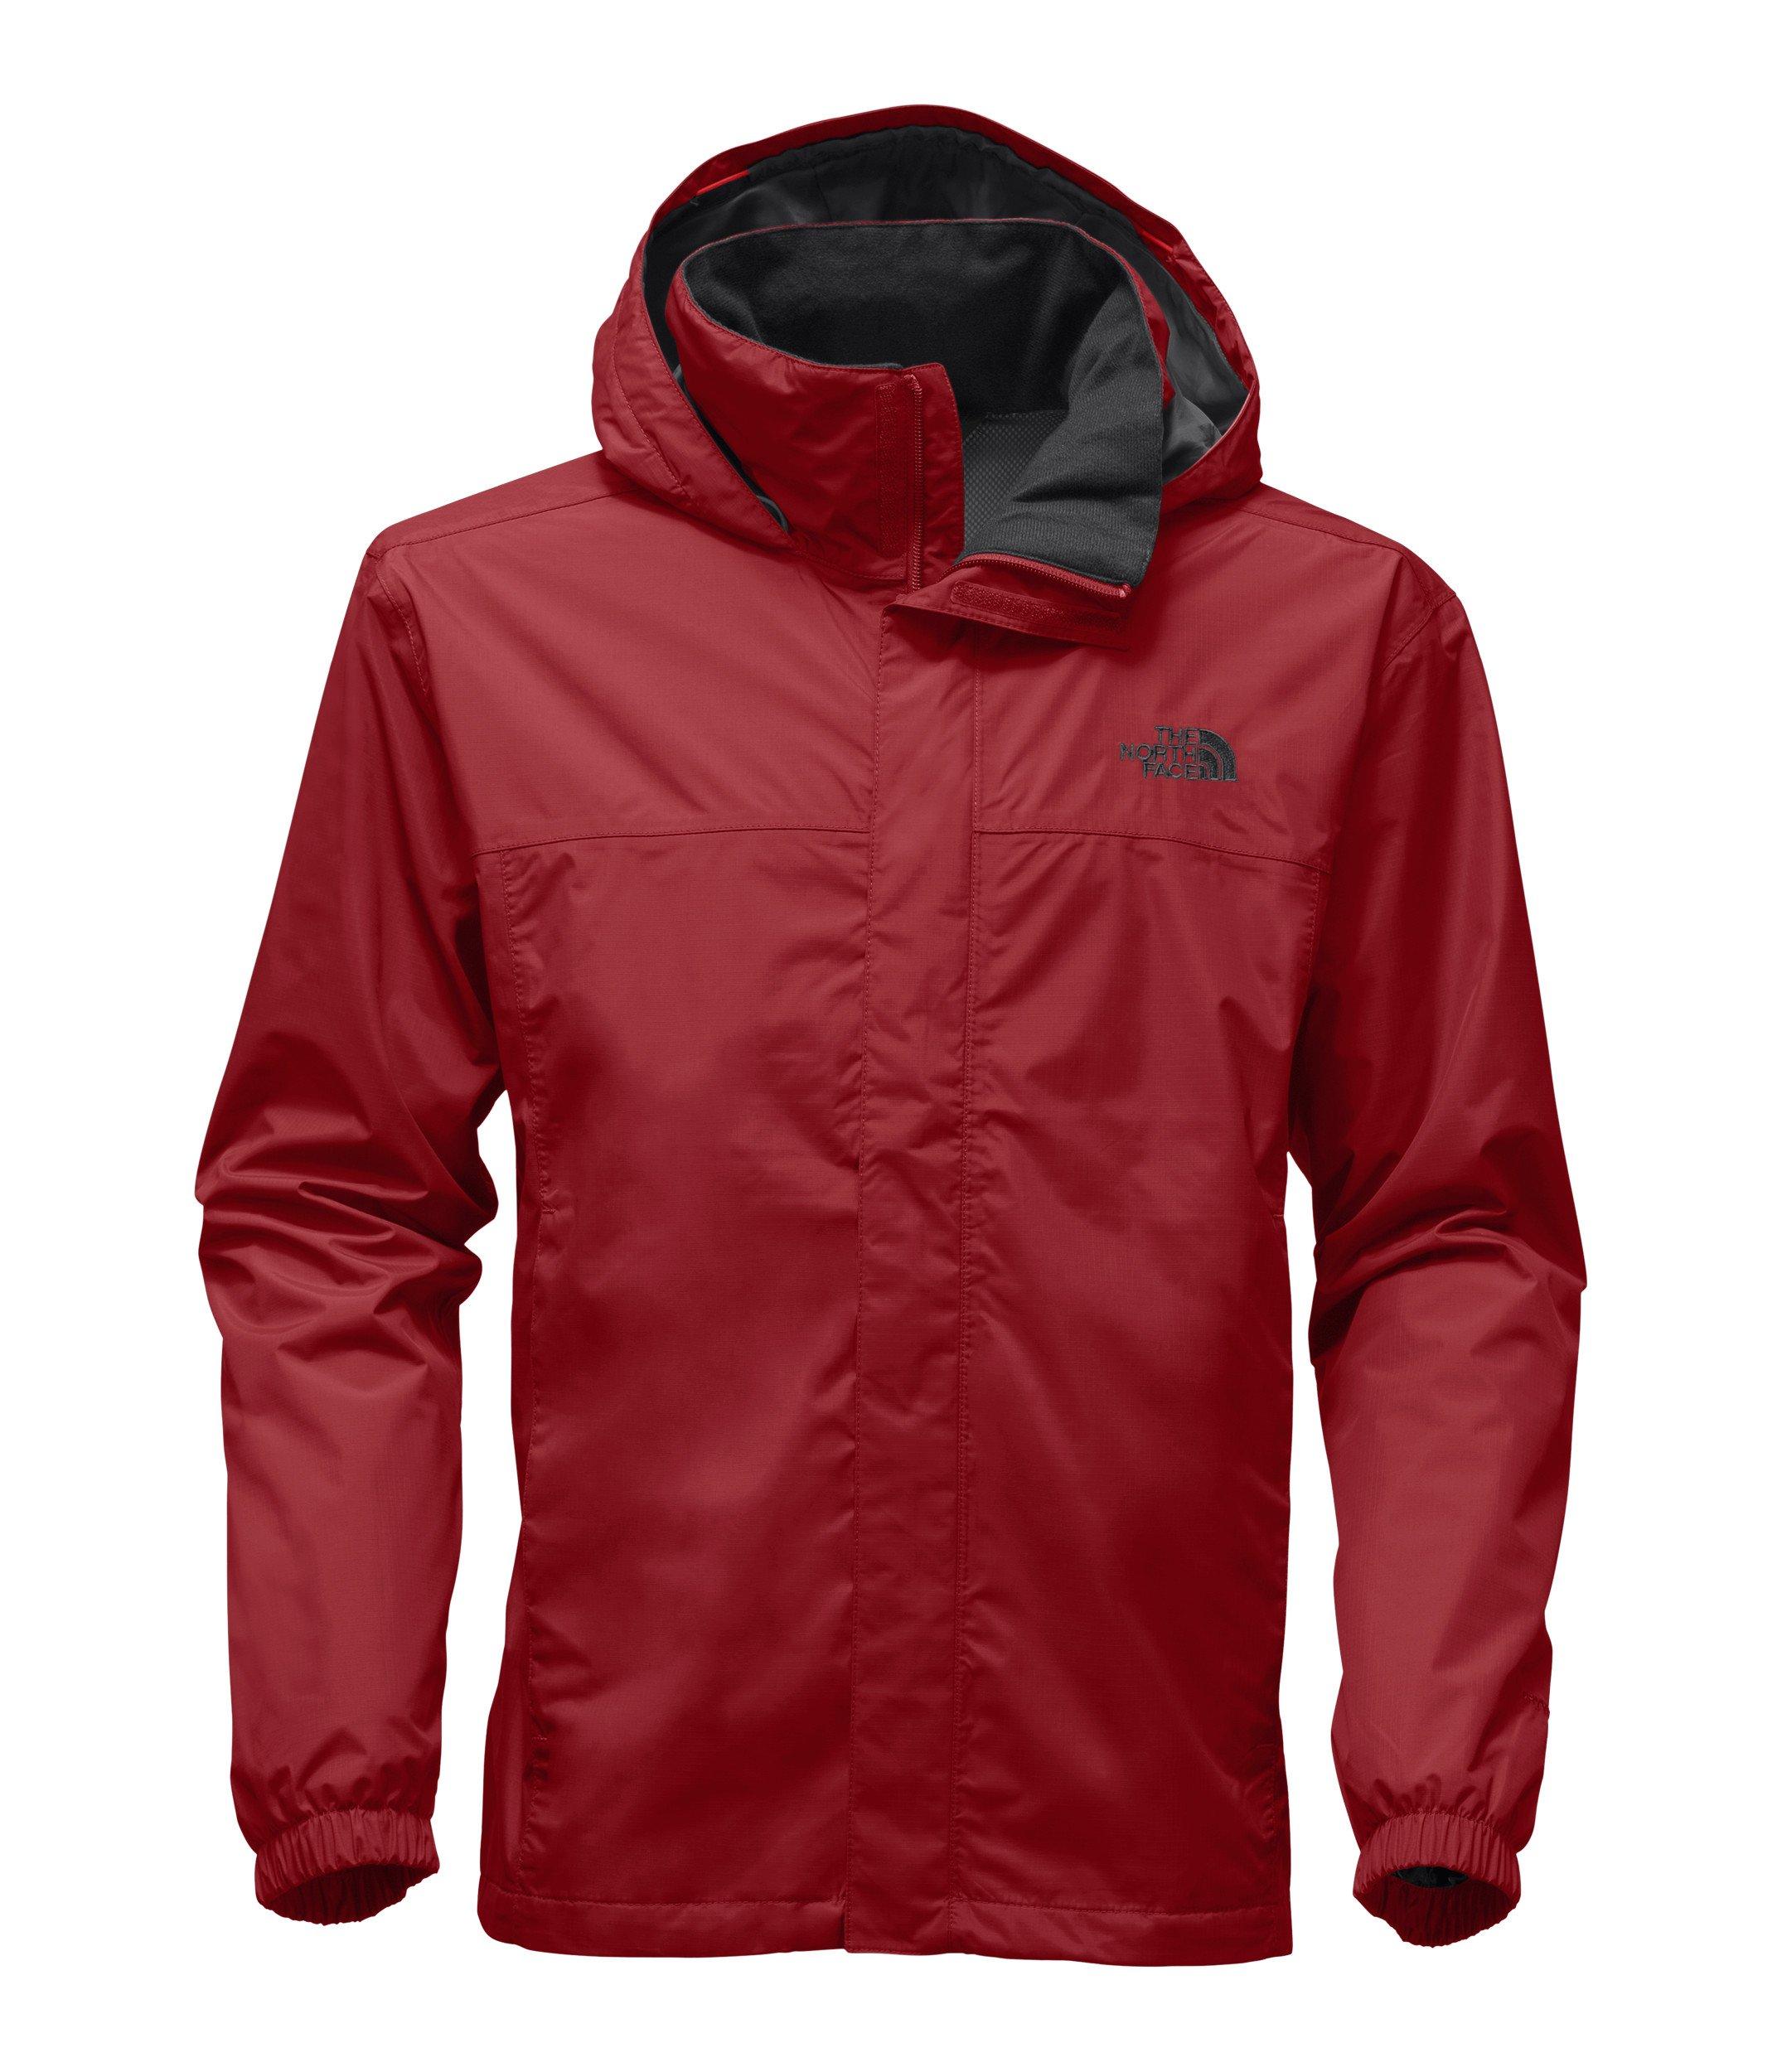 The North Face Men's Resolve 2 Jacket - Rage Red & Rage Red - XXL